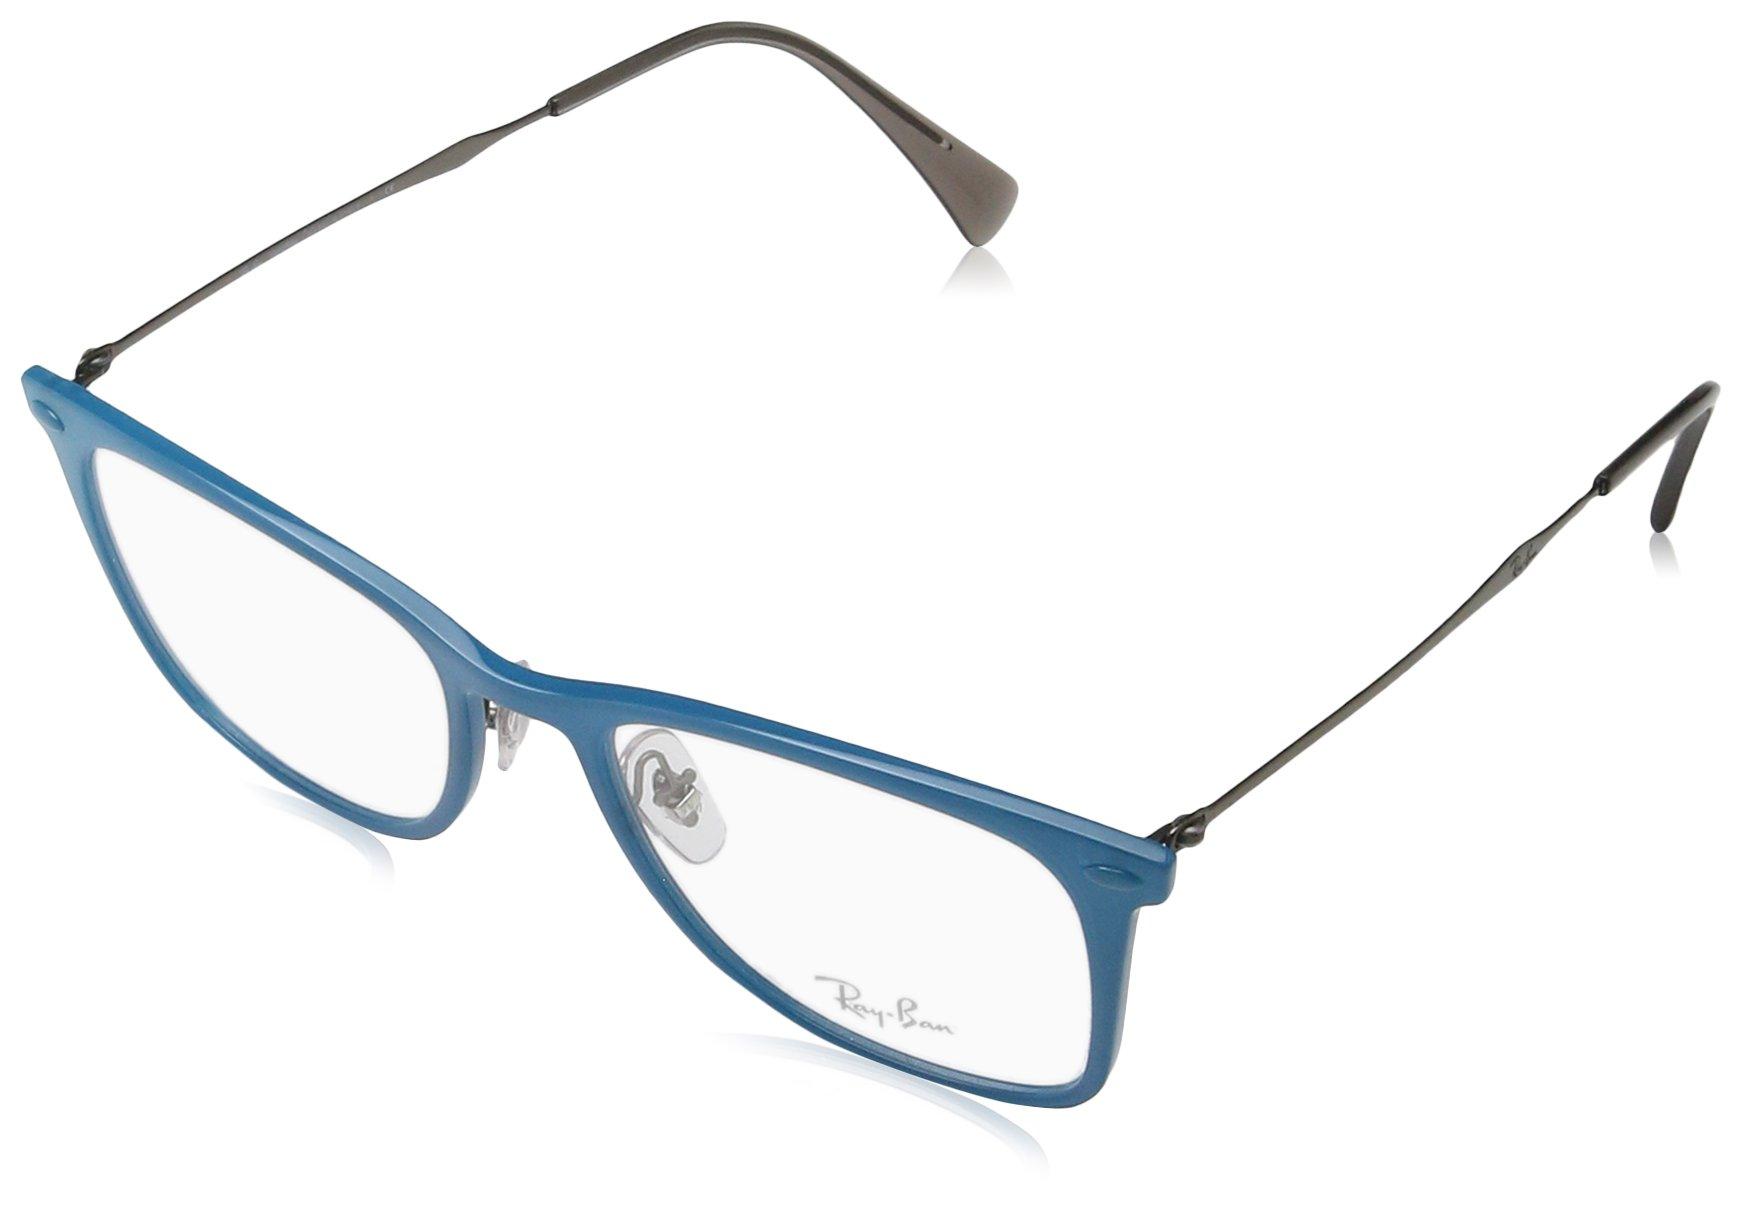 Ray-Ban Unisex RX7086 Eyeglasses Acquamarine 51mm